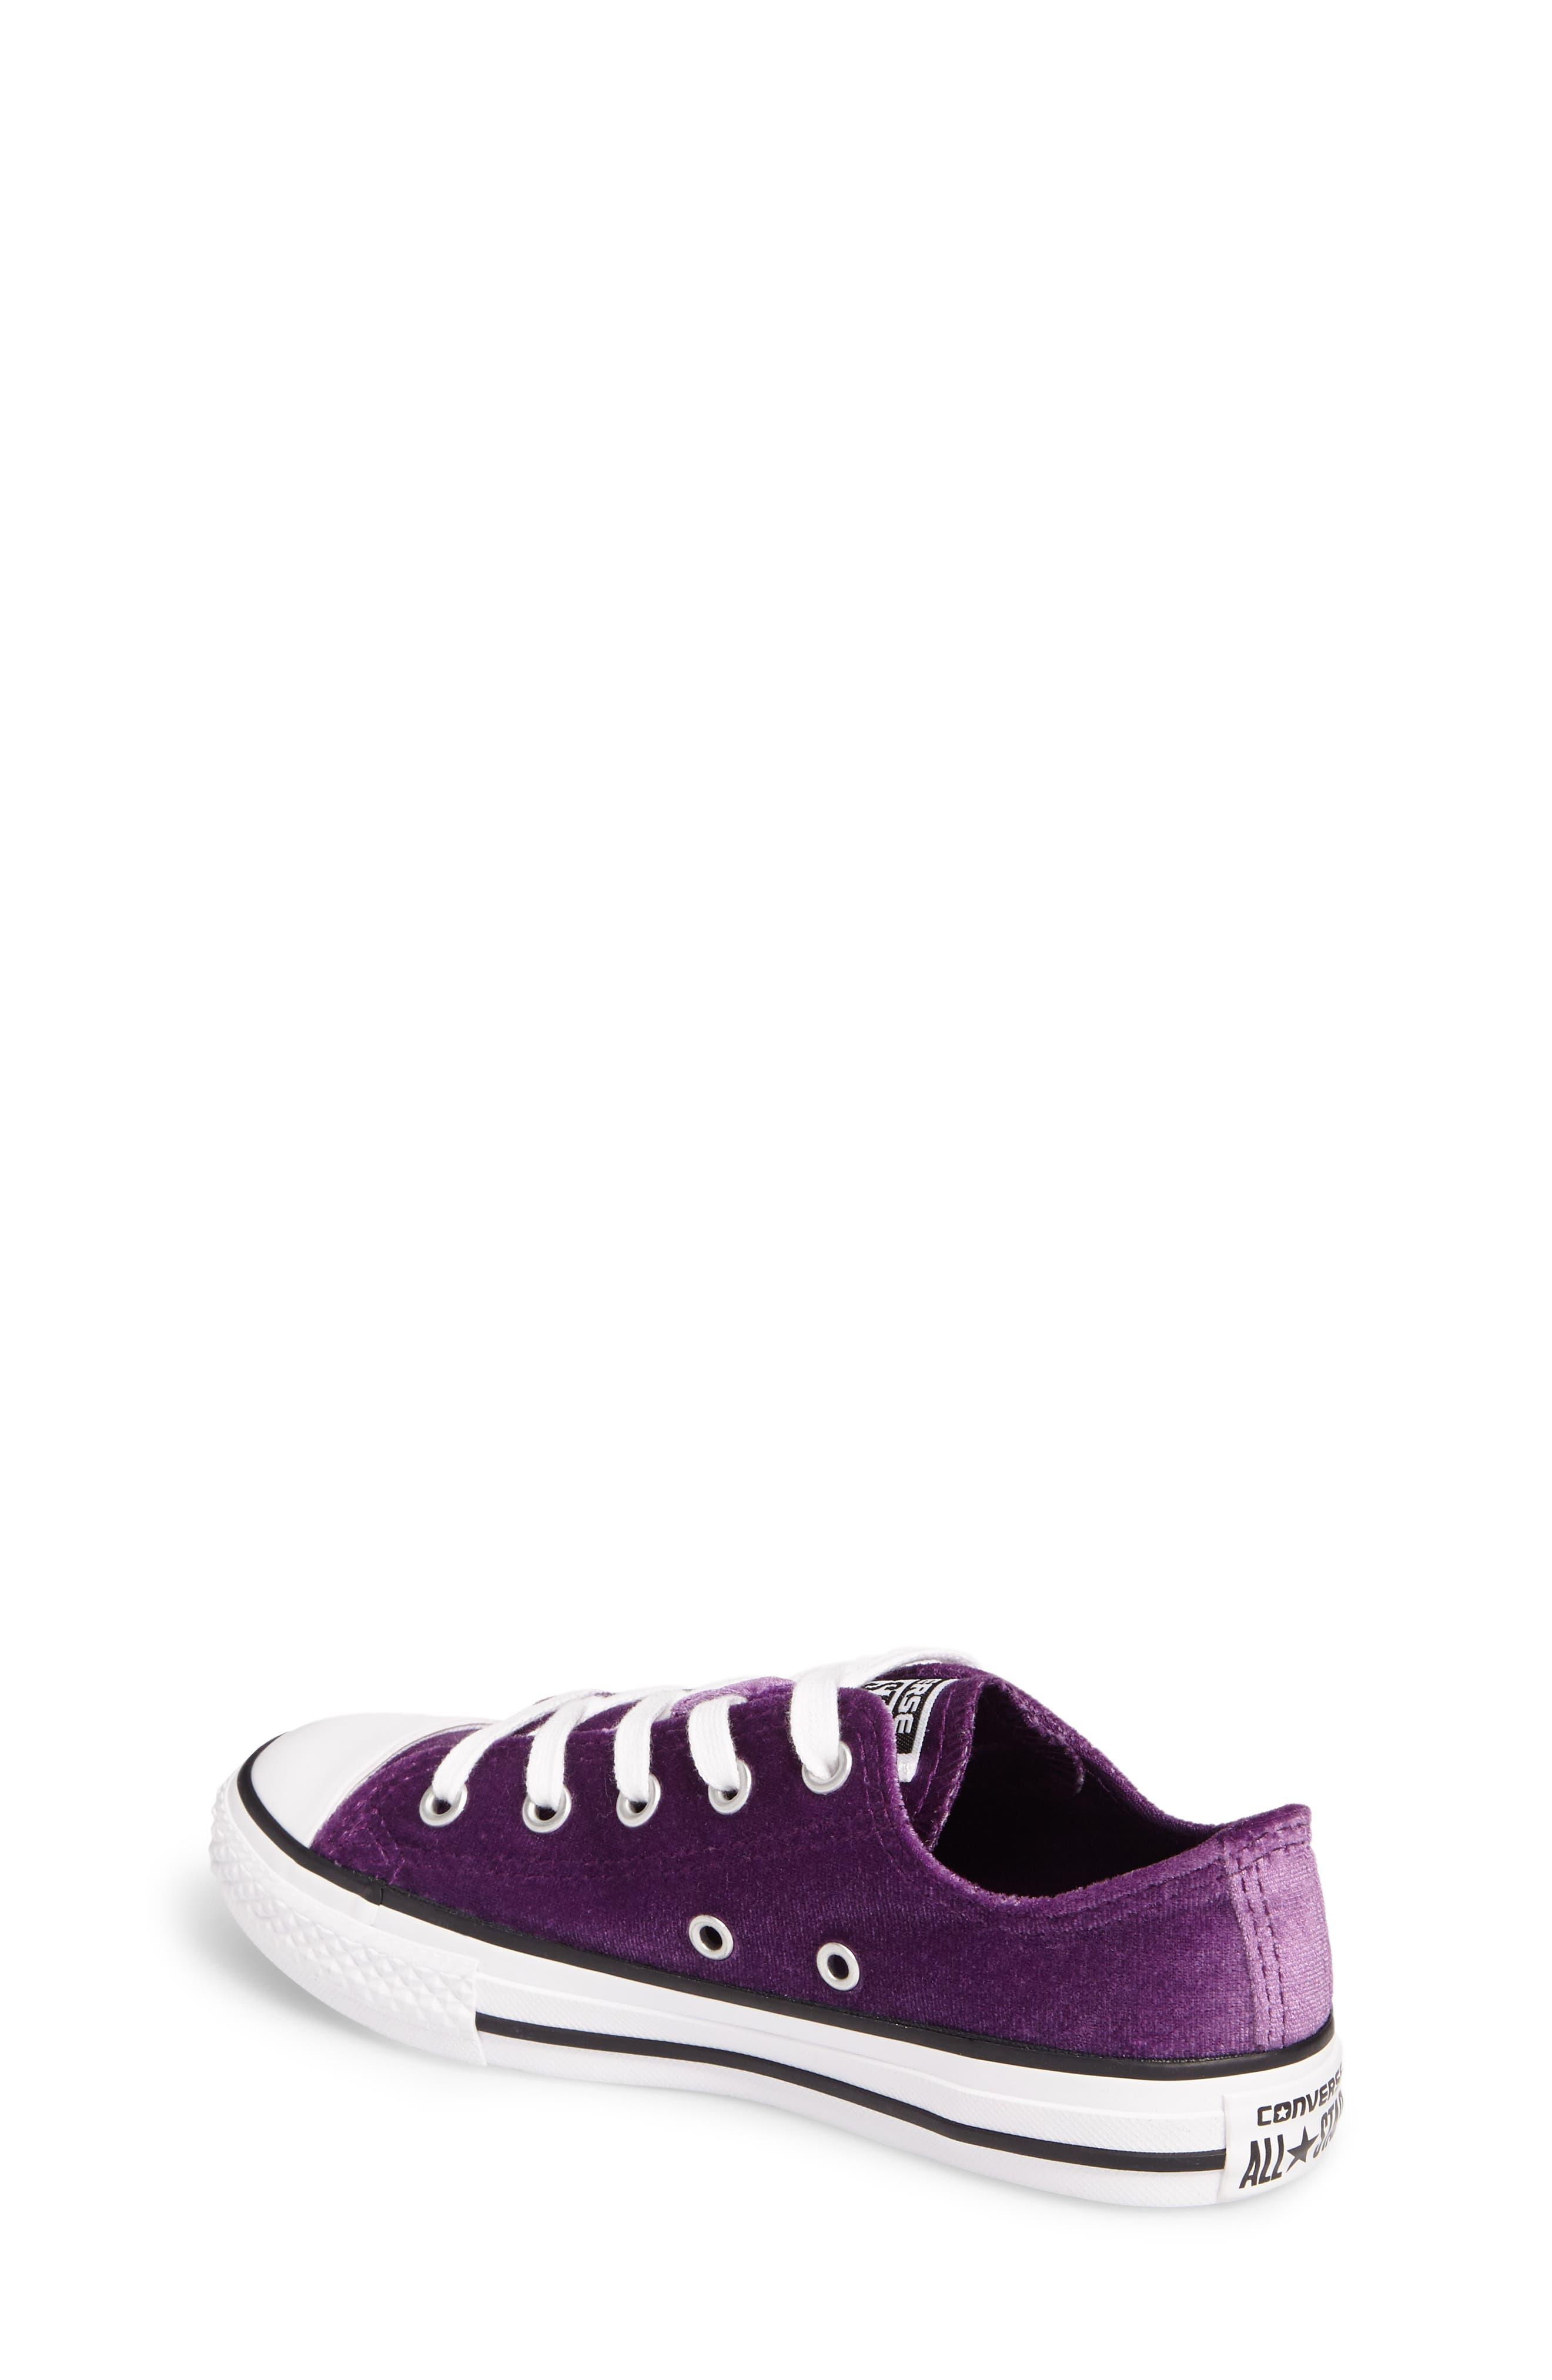 Chuck Taylor<sup>®</sup> All Star<sup>®</sup> Velvet OX Low Top Sneaker,                             Alternate thumbnail 2, color,                             Night Purple Velvet